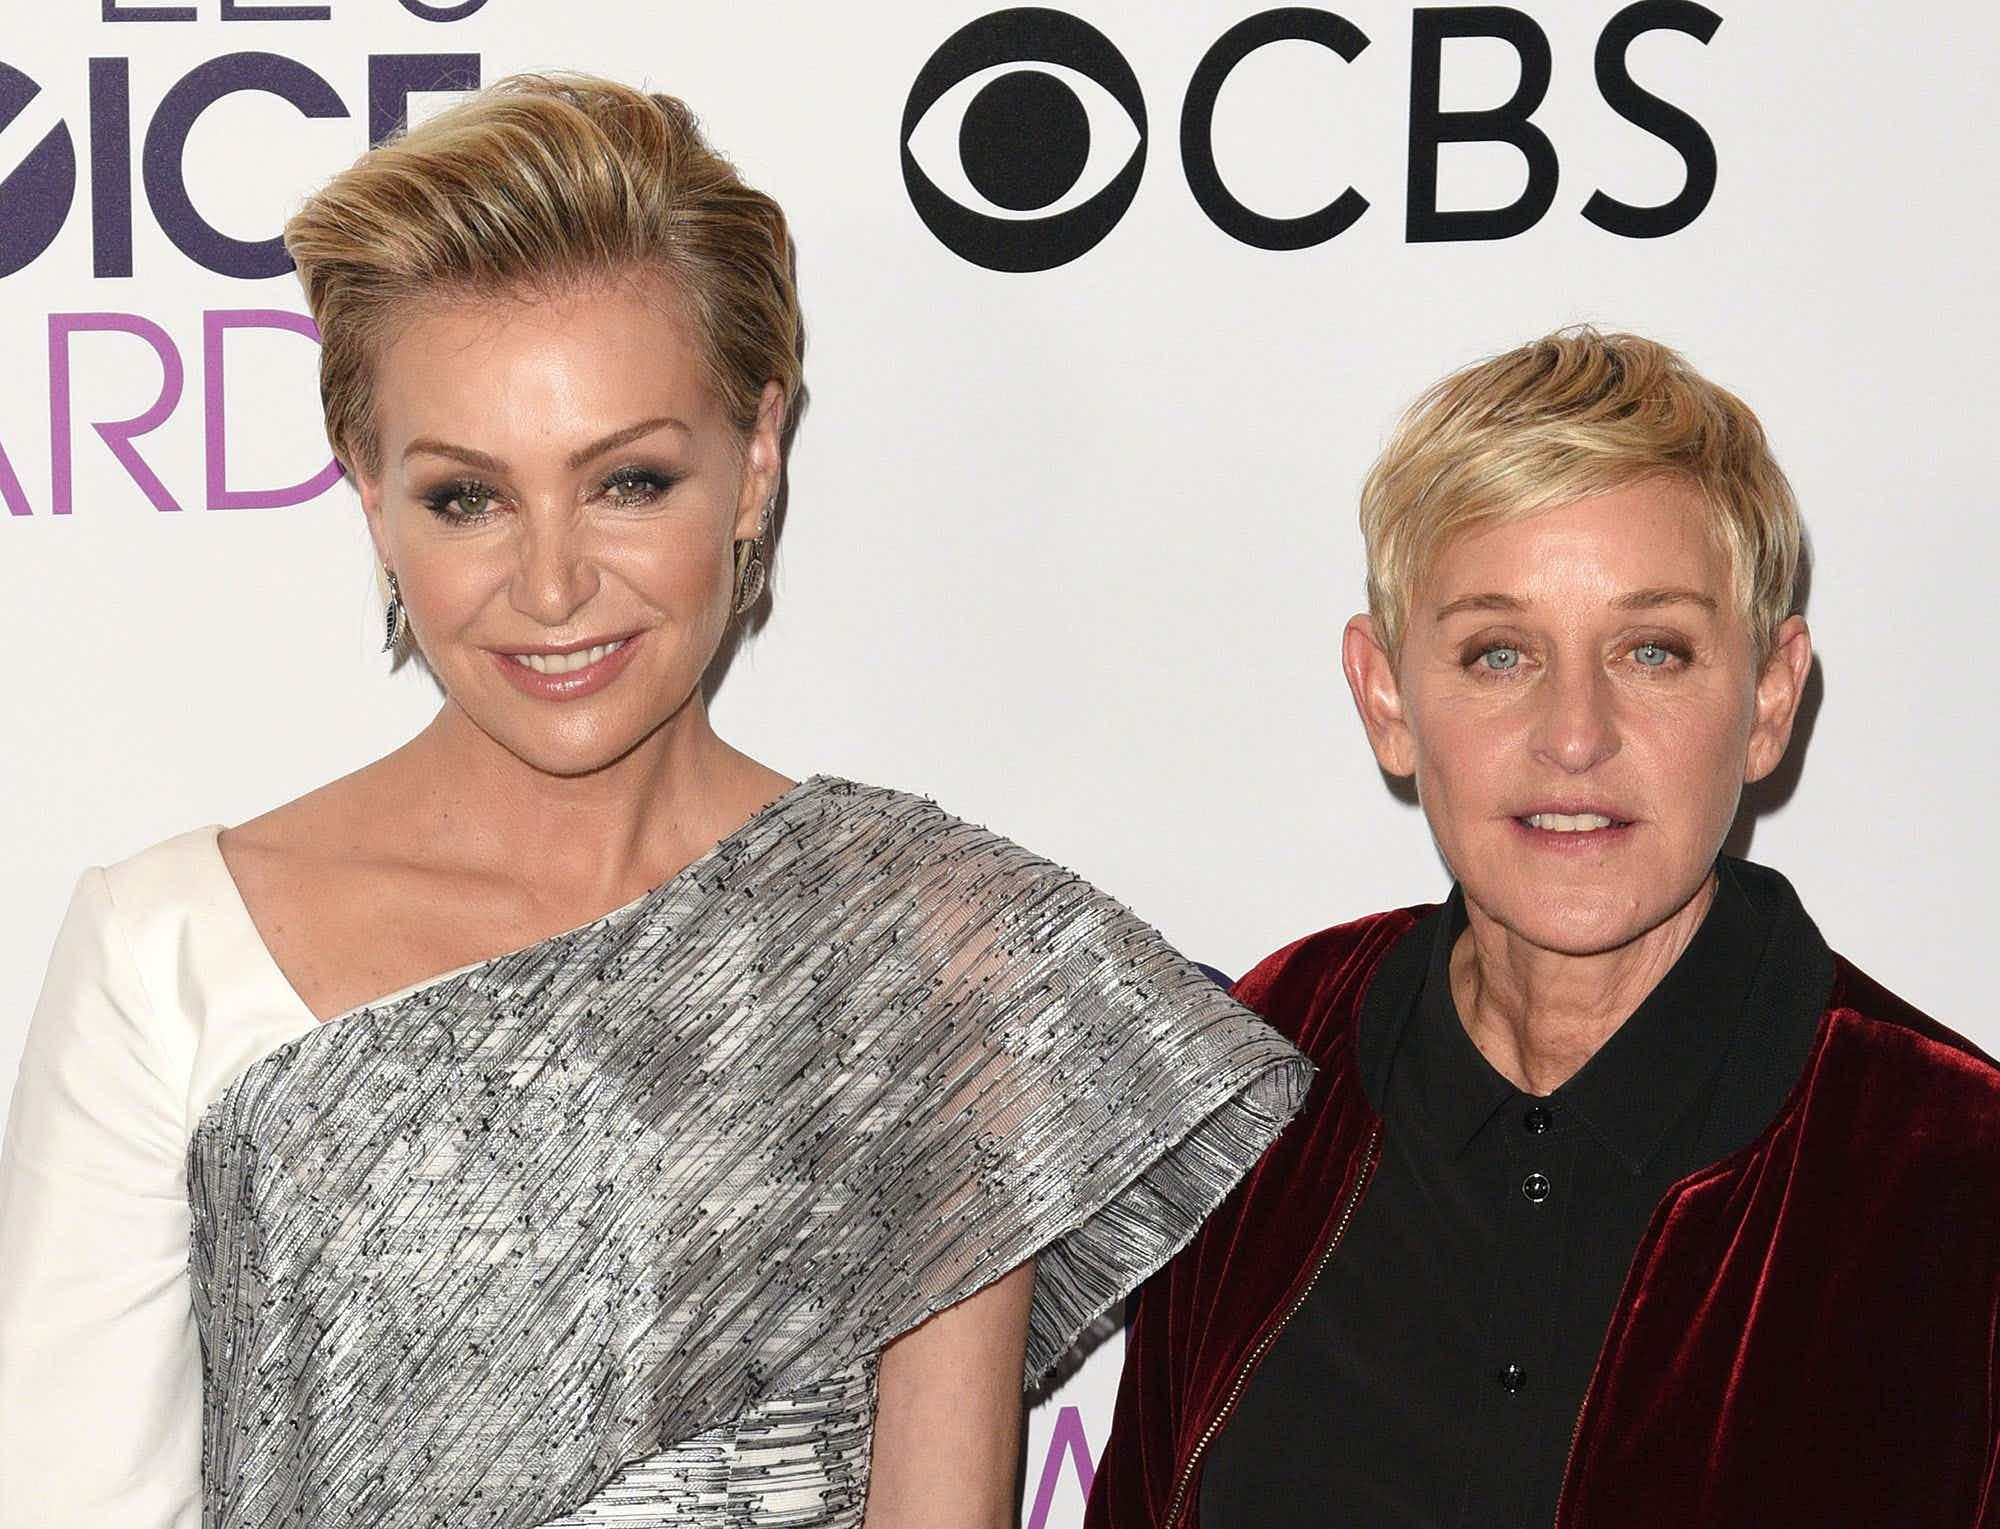 Ellen DeGeneres and Portia de Rossi wrap up their birthday tour of East Africa